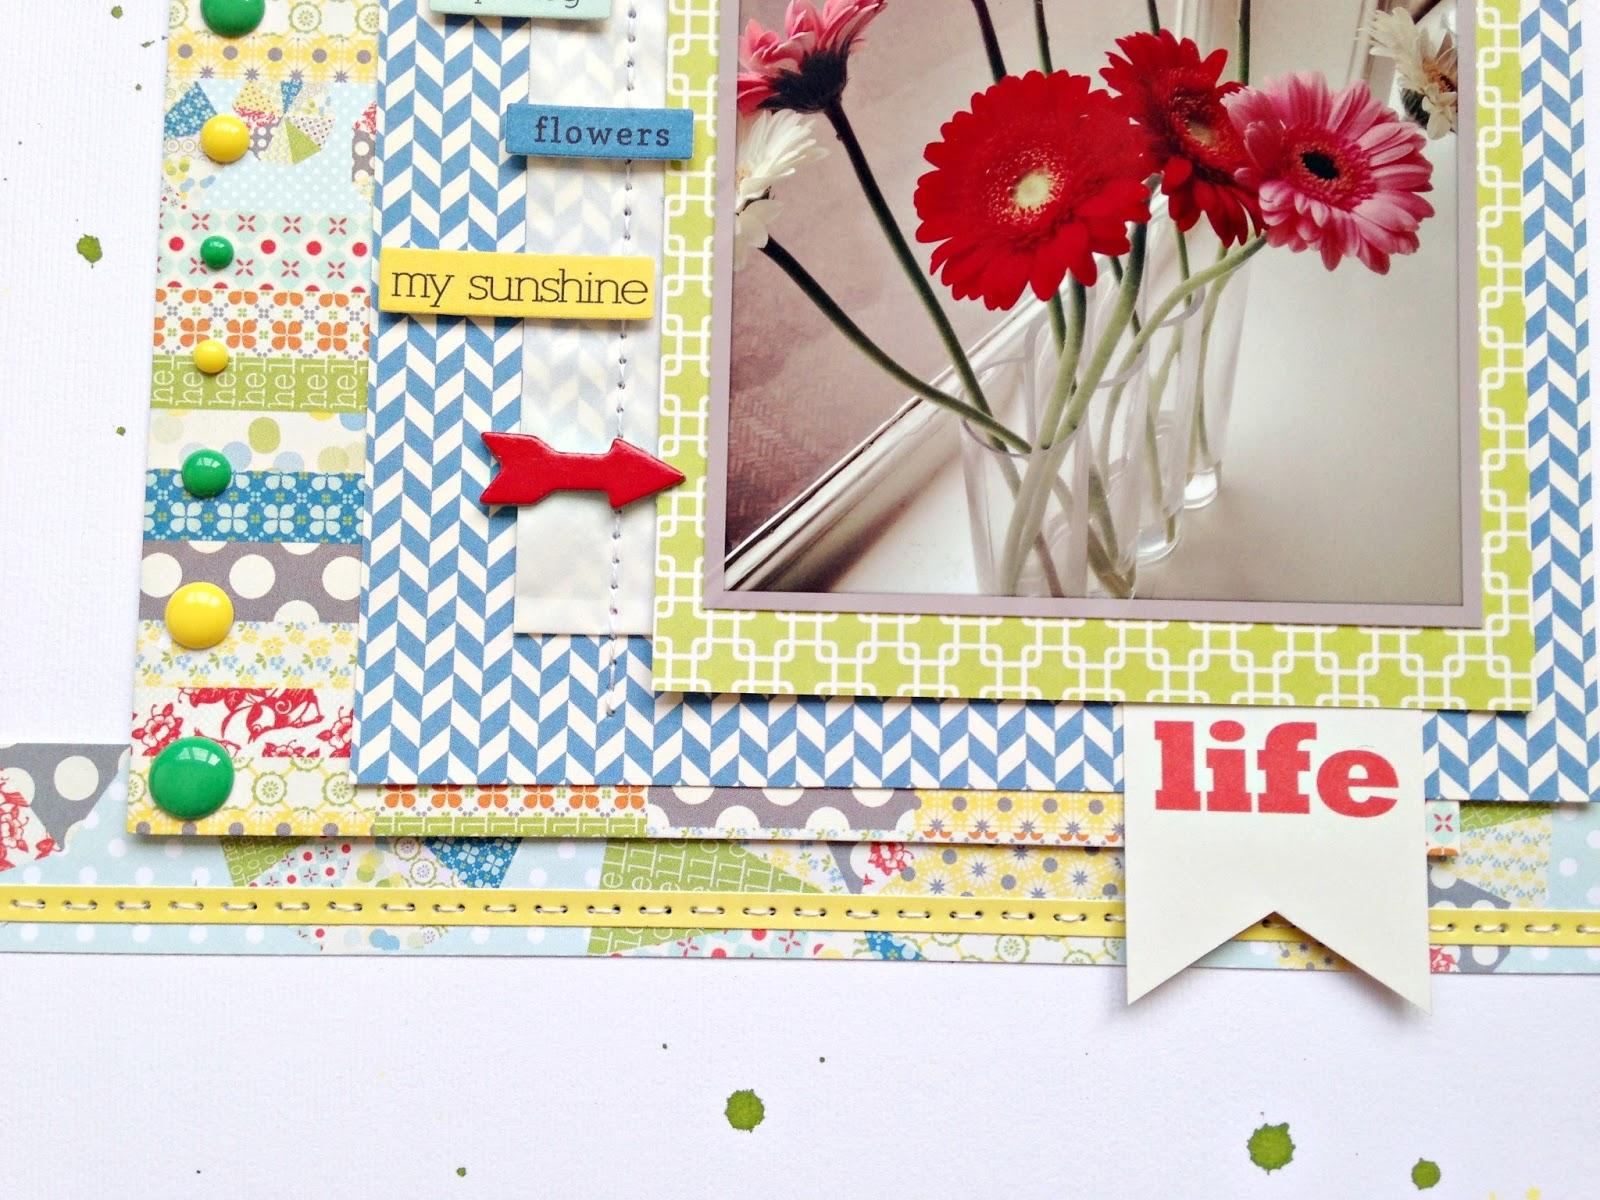 How to design scrapbook using colored paper - Paper Scrapbook June Color Challenge